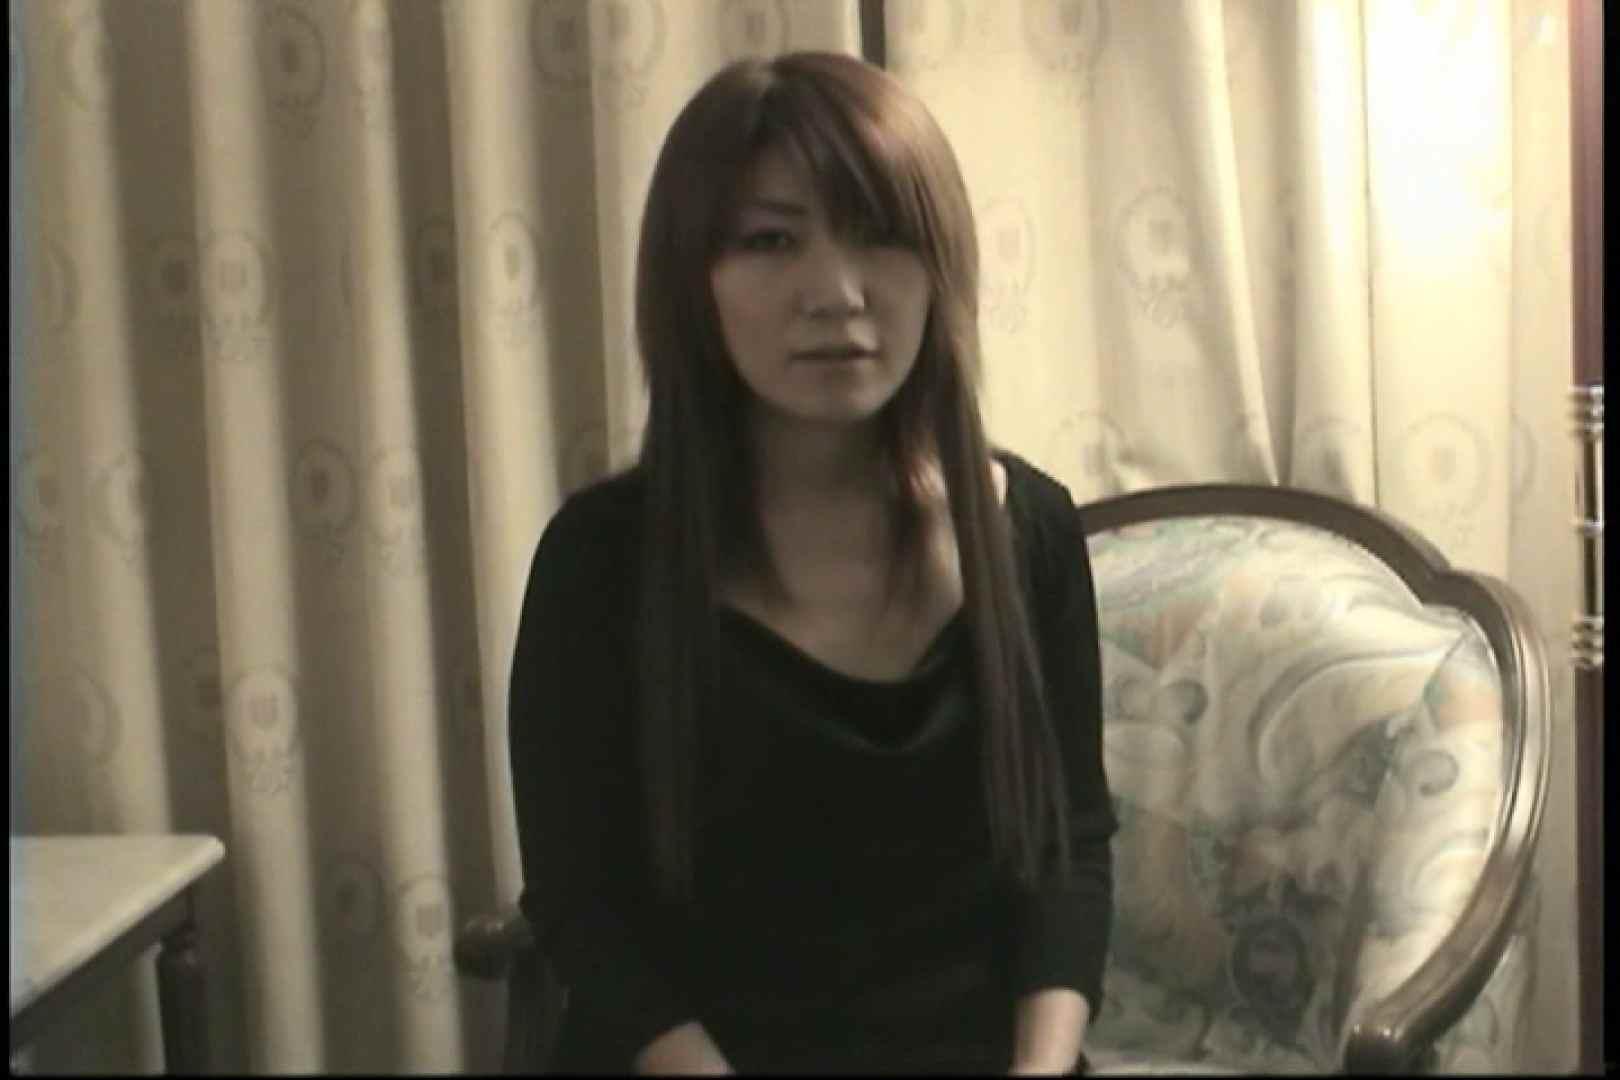 H大好きな清楚系の美ボディお姉さんとホテルでSEX~安西みか~ フェラ 戯れ無修正画像 97枚 8